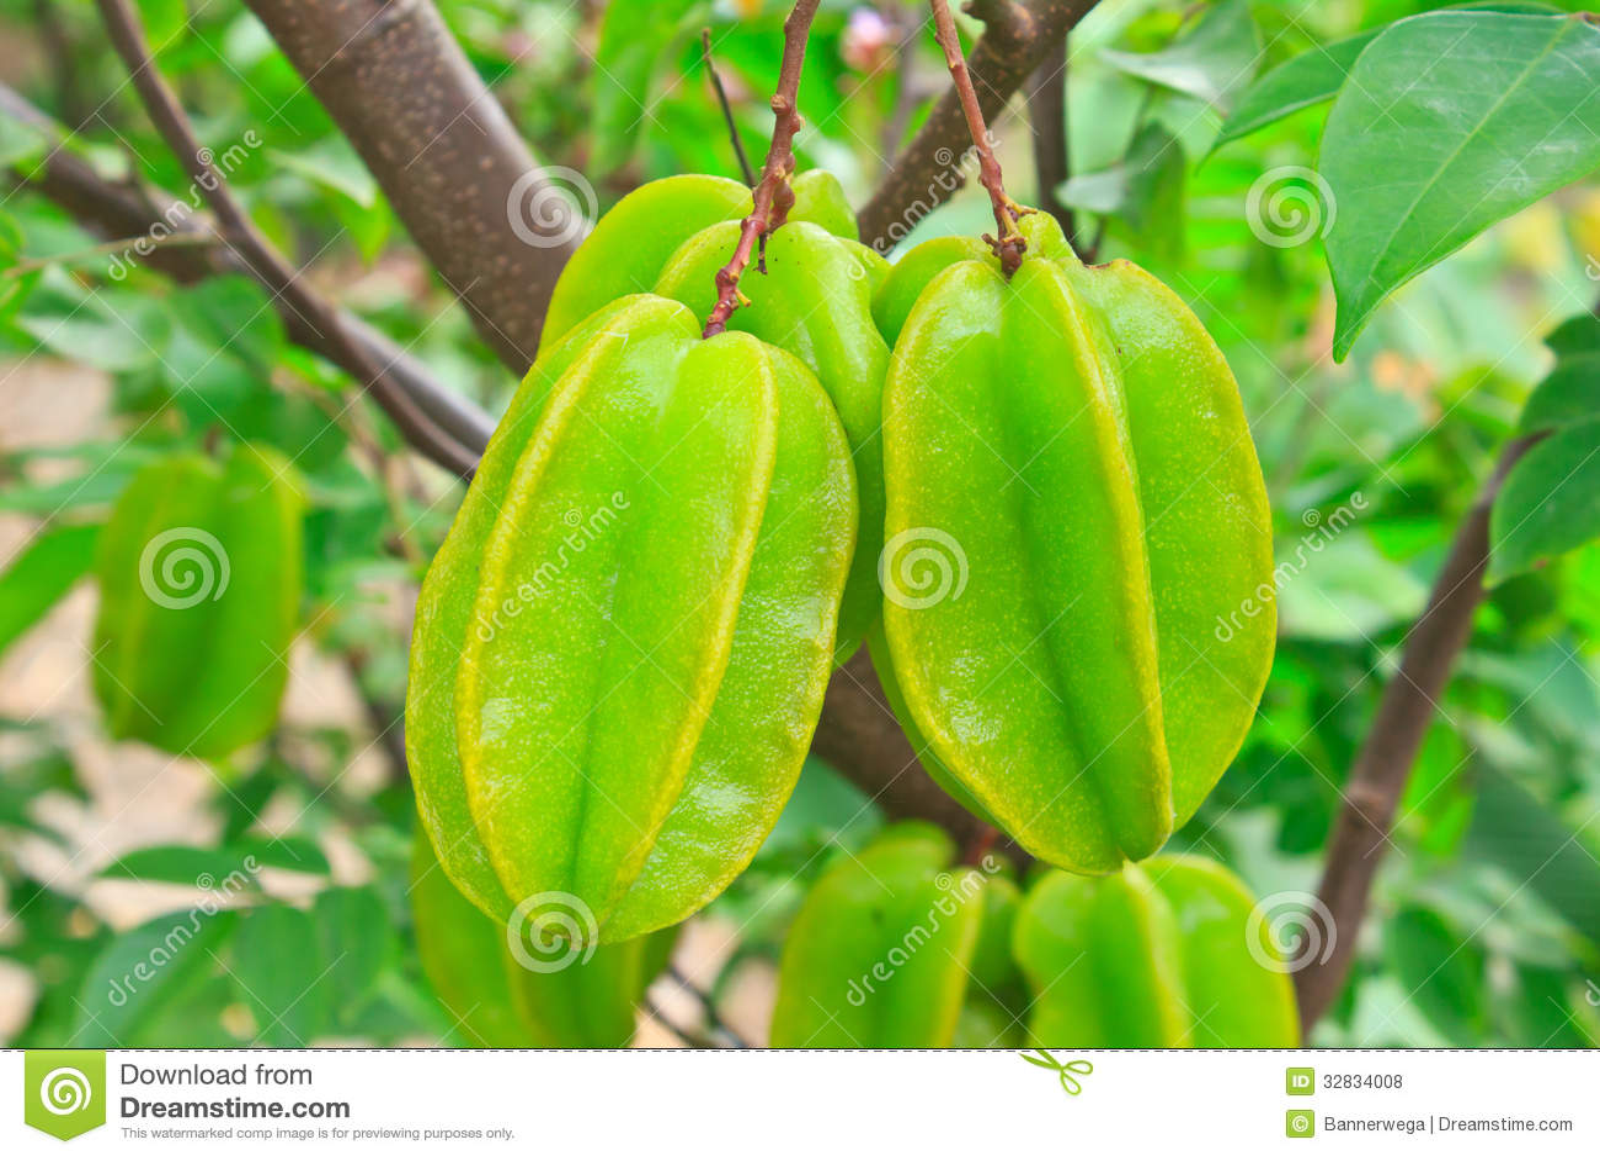 Star Fruit Royalty Free Stock Photos - Image: 32834008